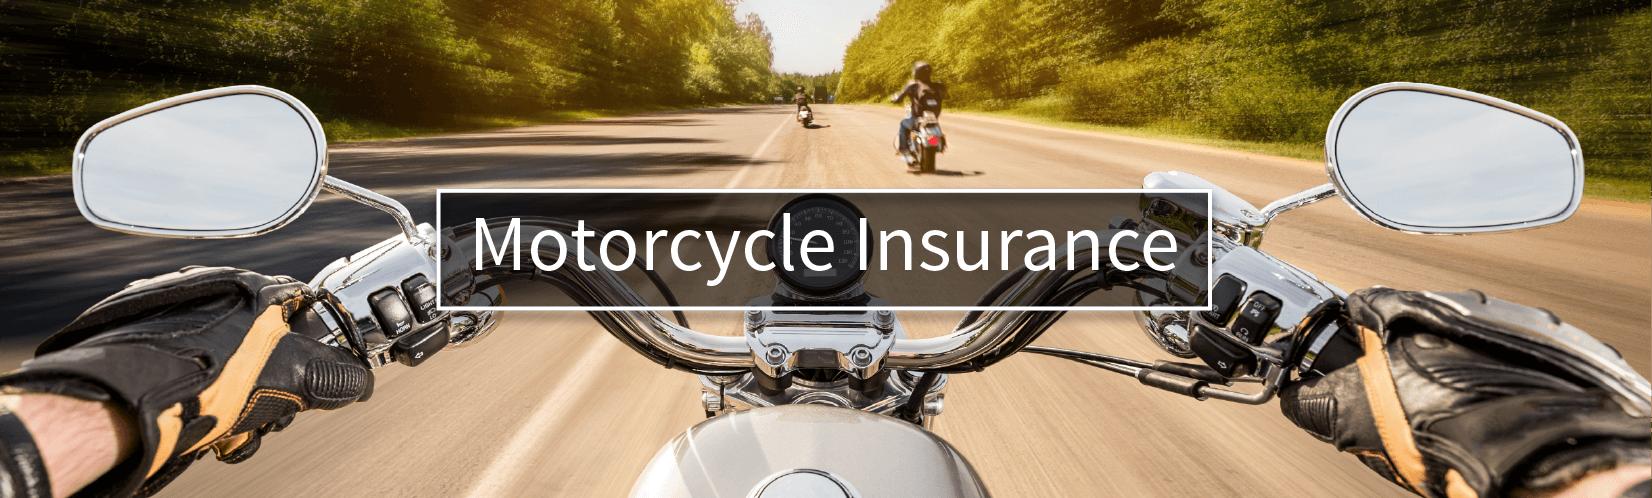 Motorcycle Insurance Header Massachusetts